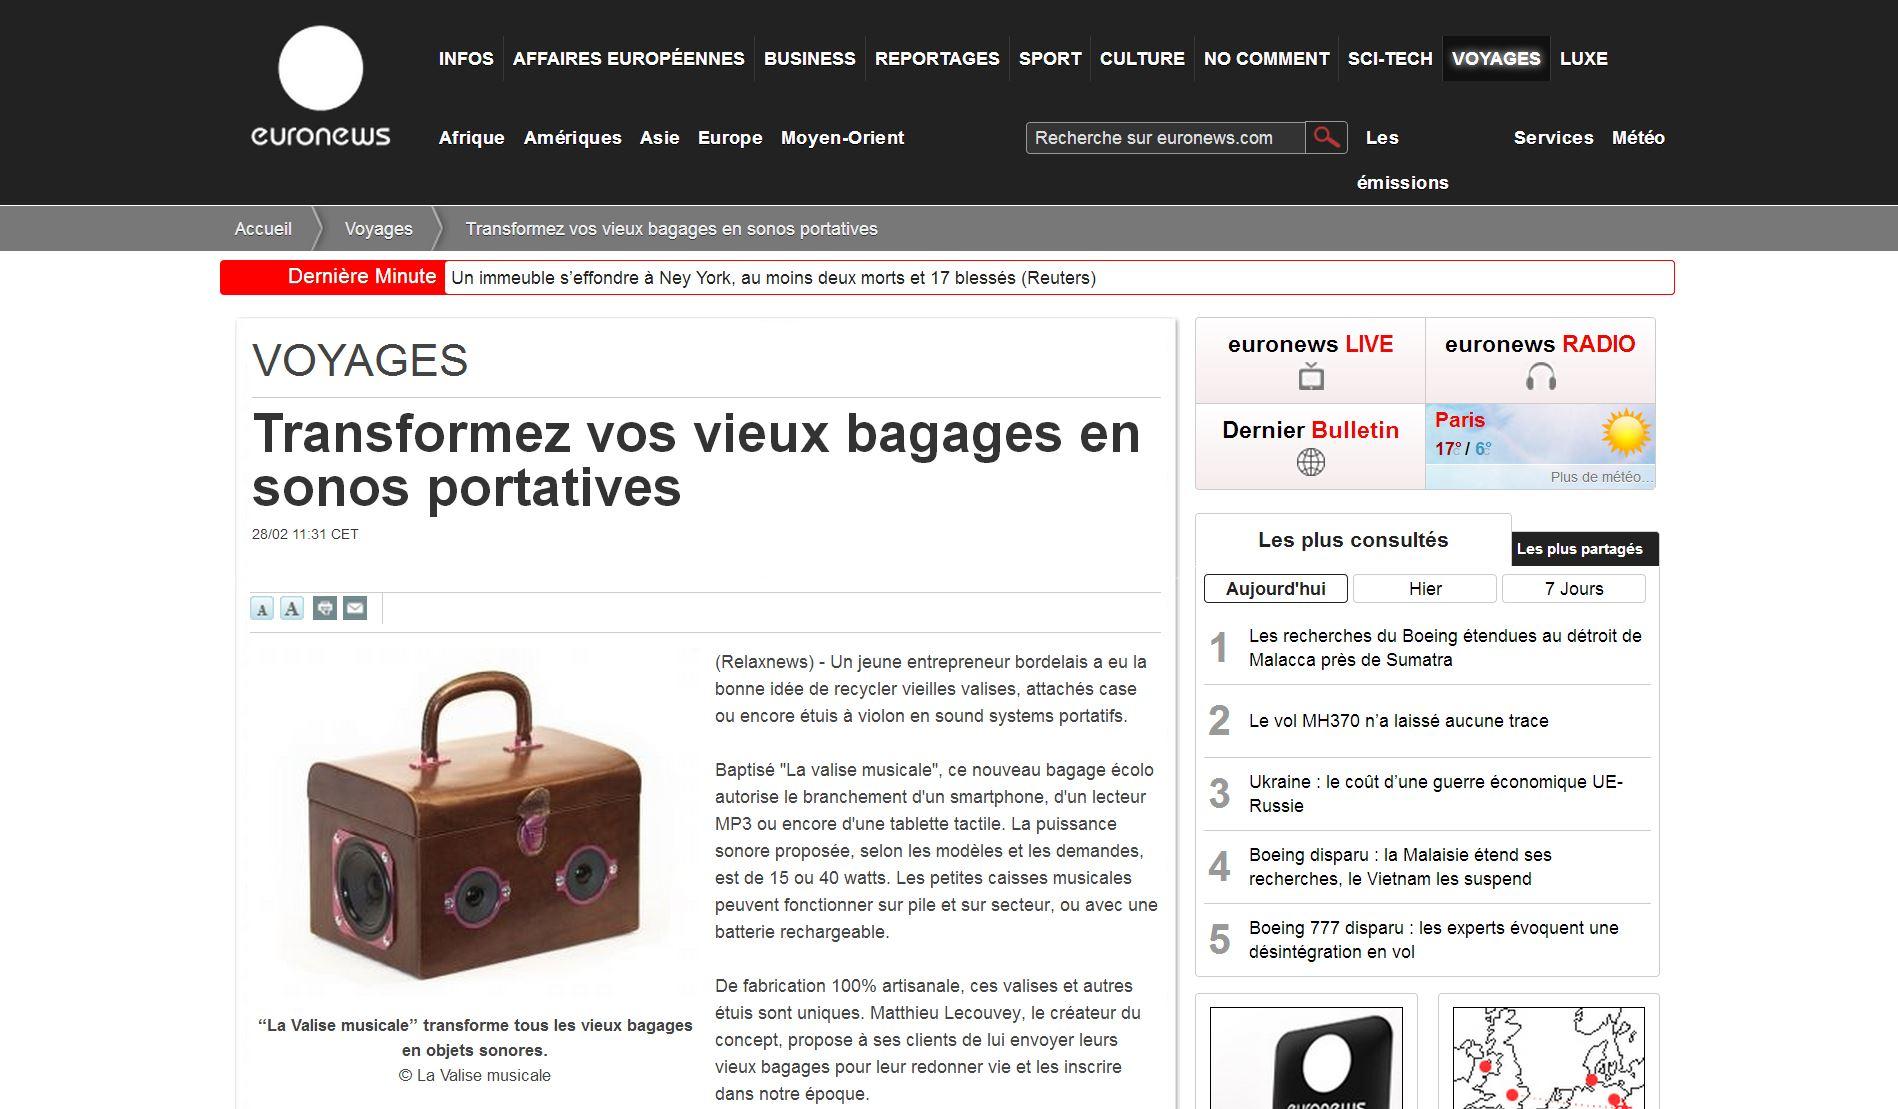 Valise Musicale chez Euronews.com